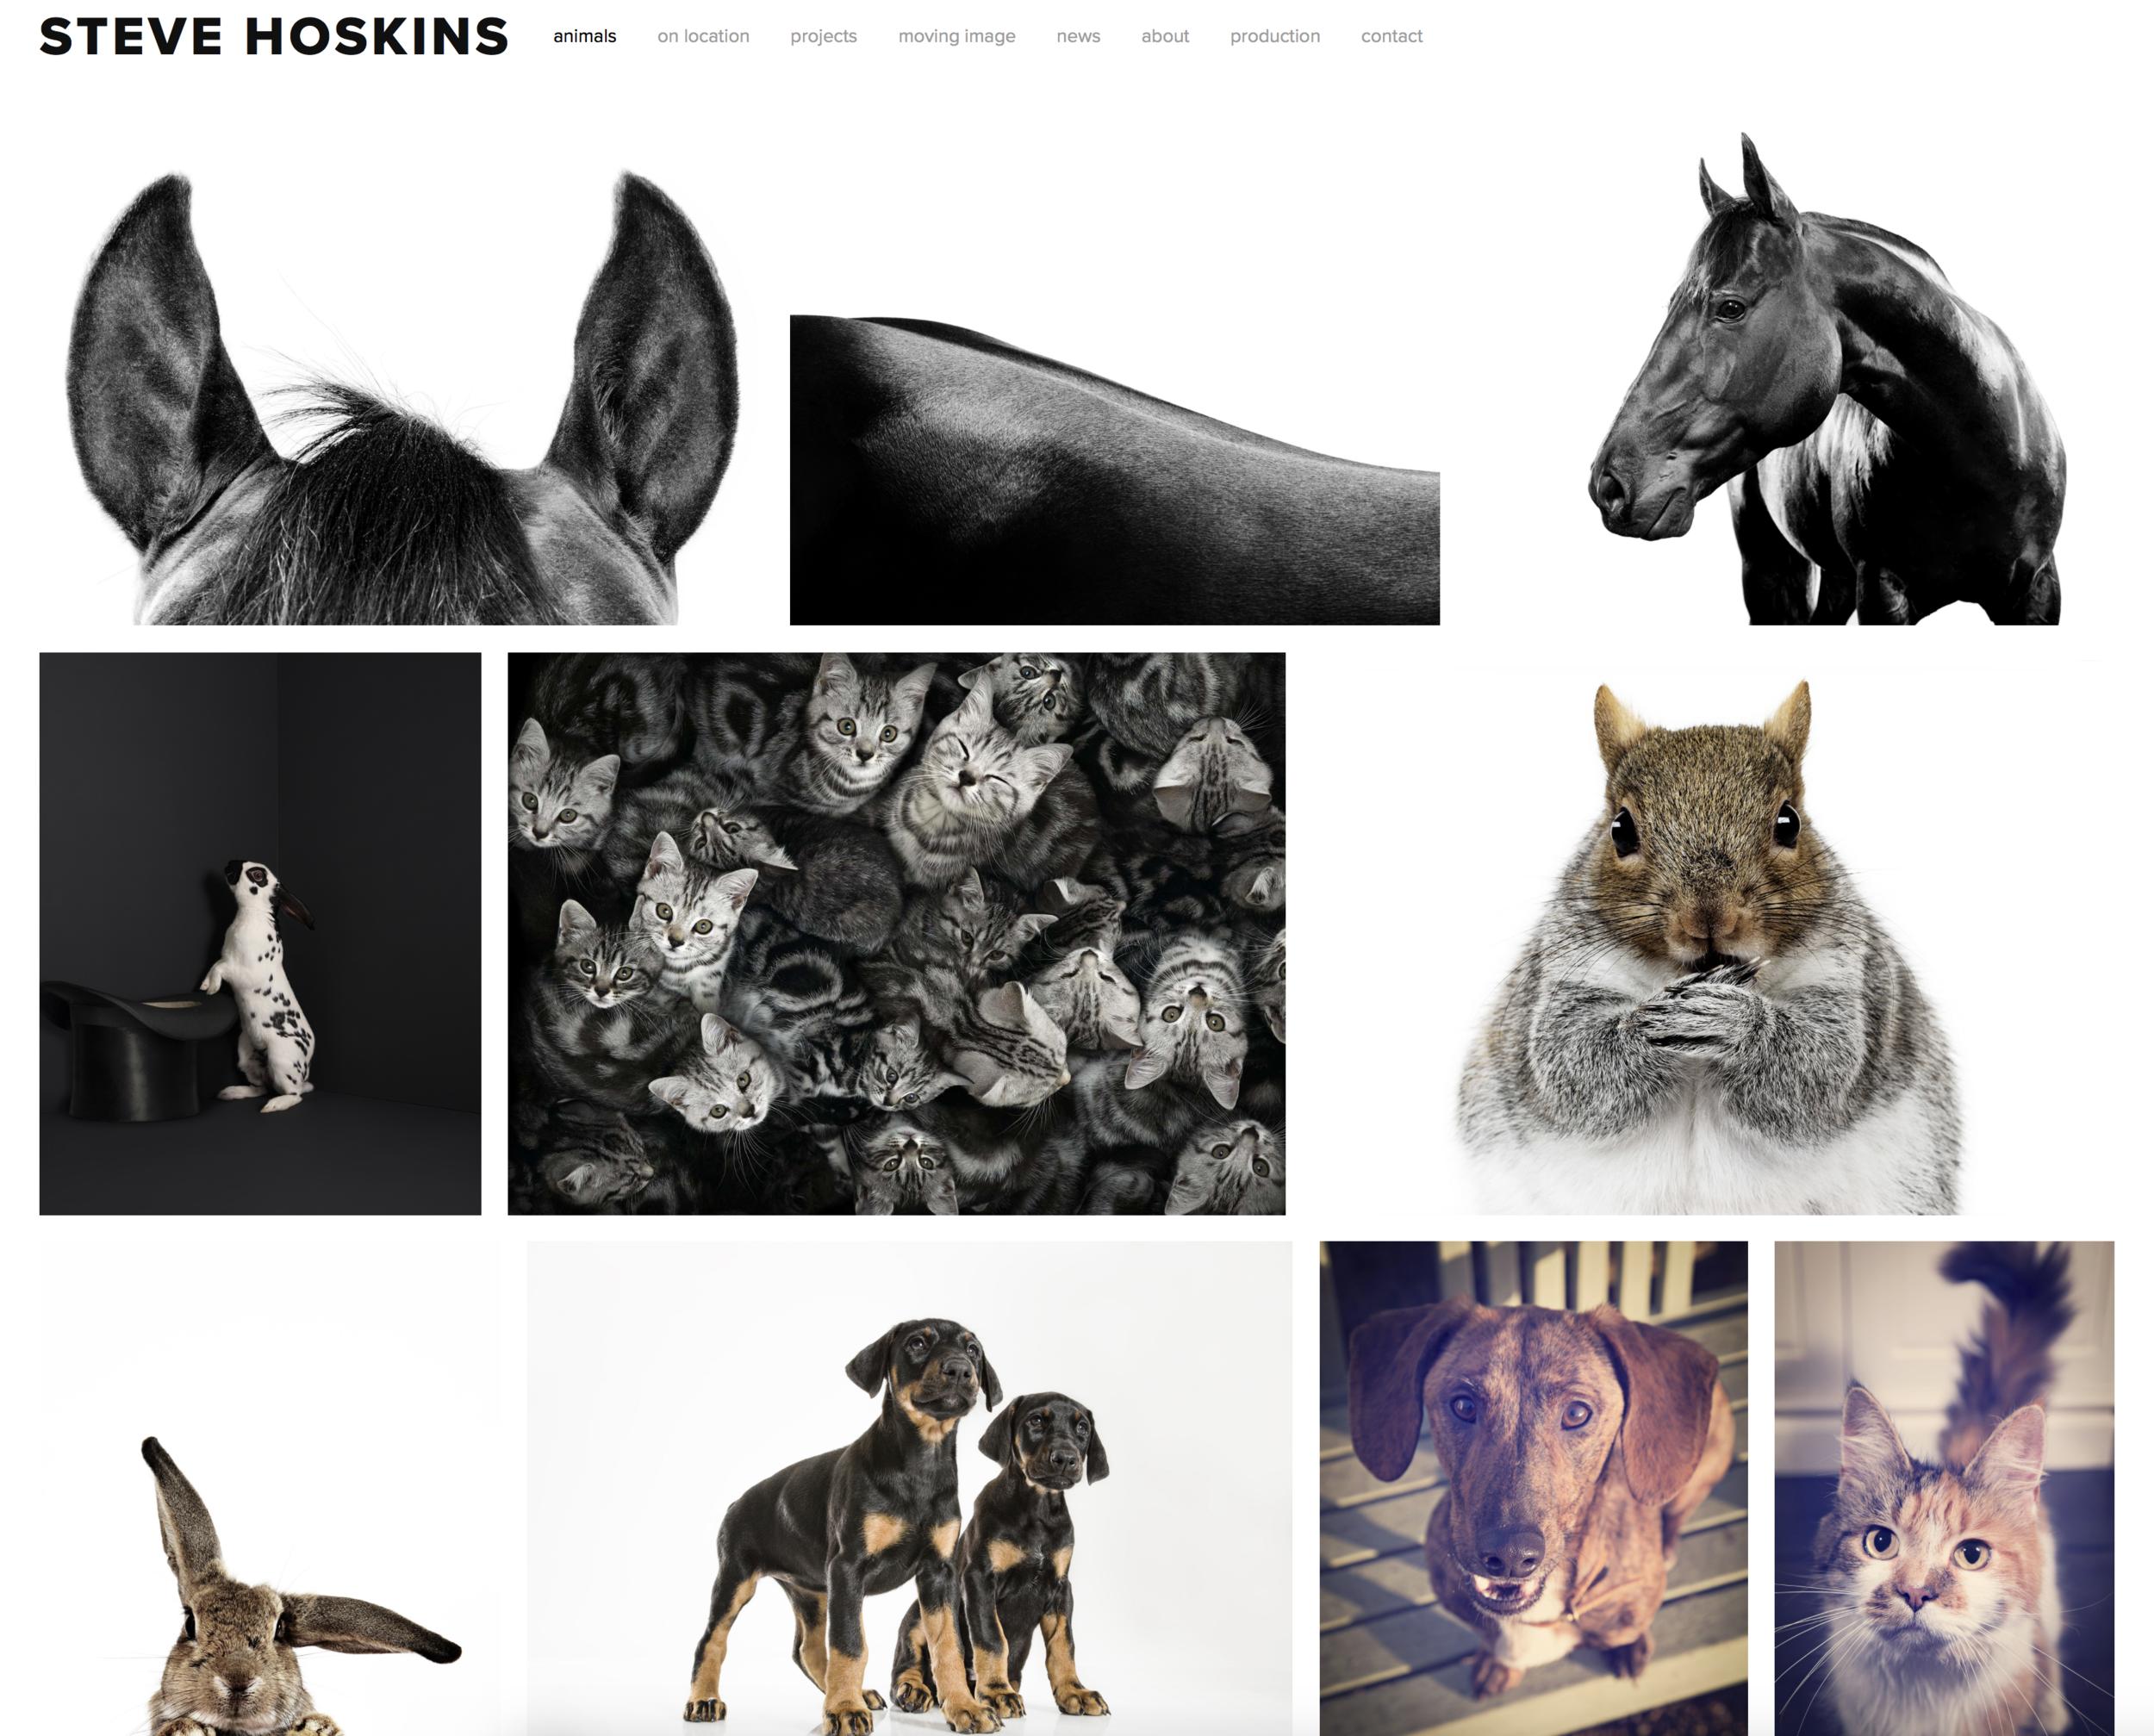 Steve Hoskins new website animal photography